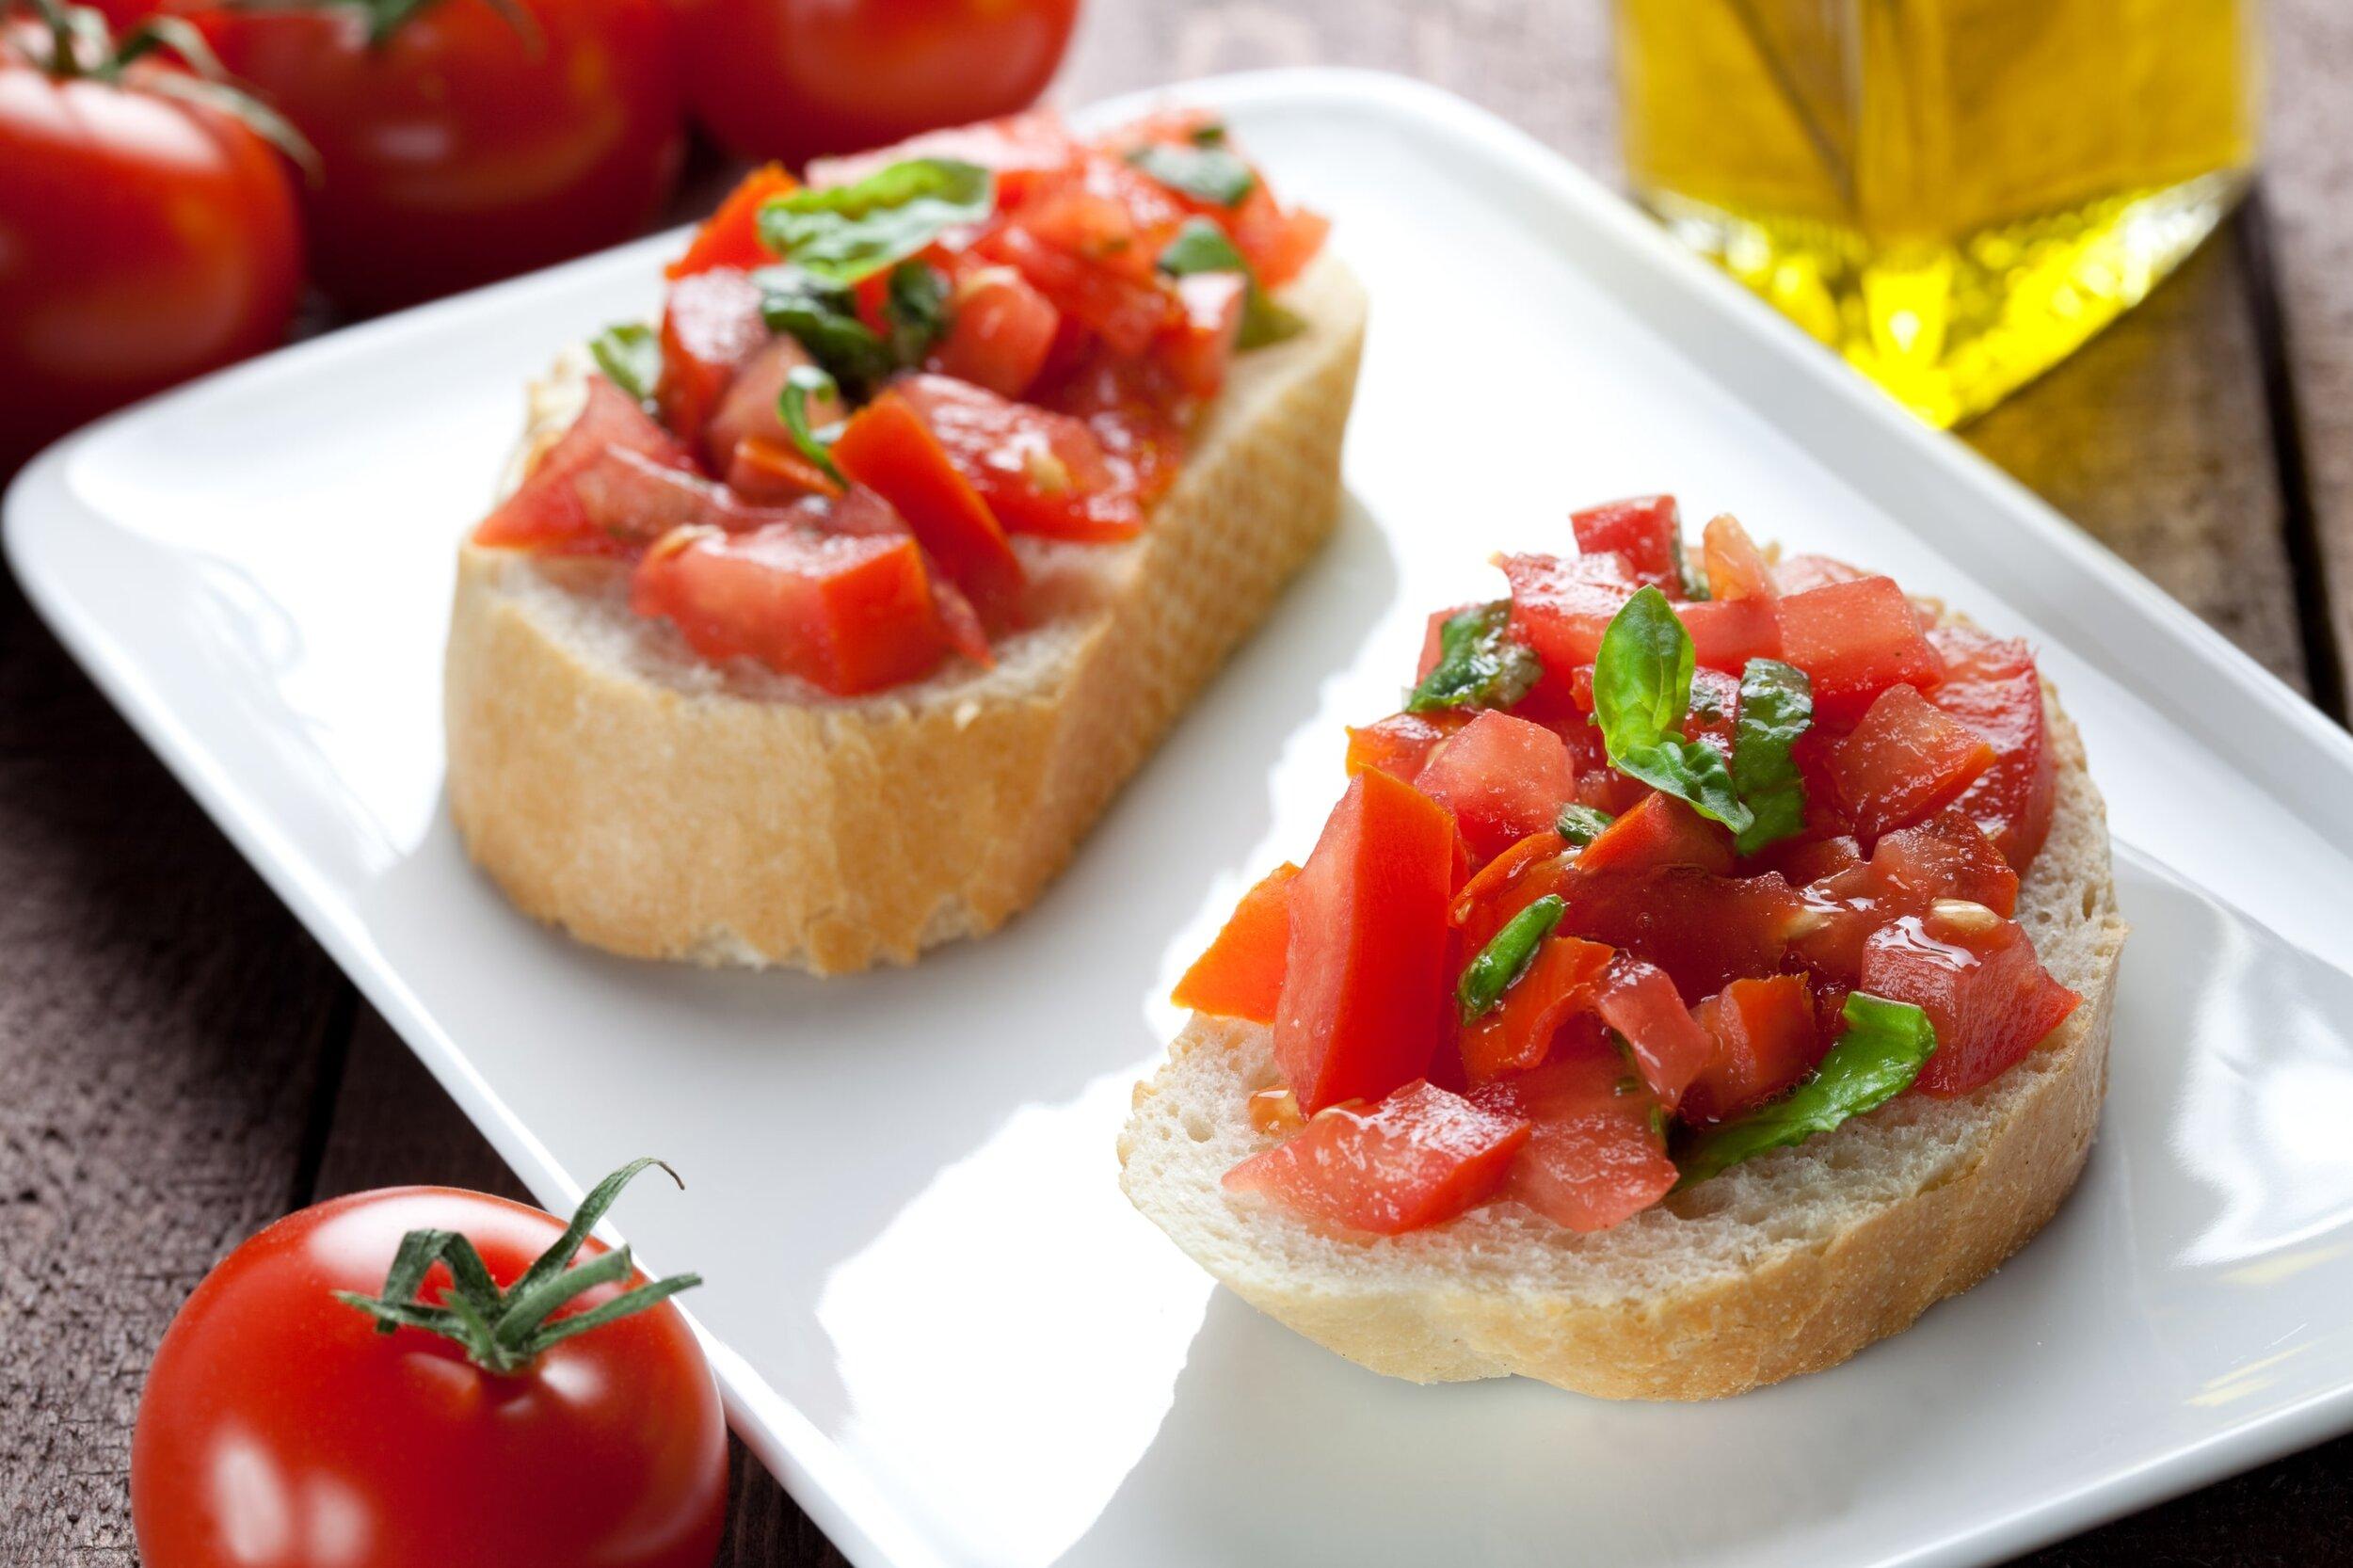 Italian vegan appetizer, Bruschetta con Pomodoro: